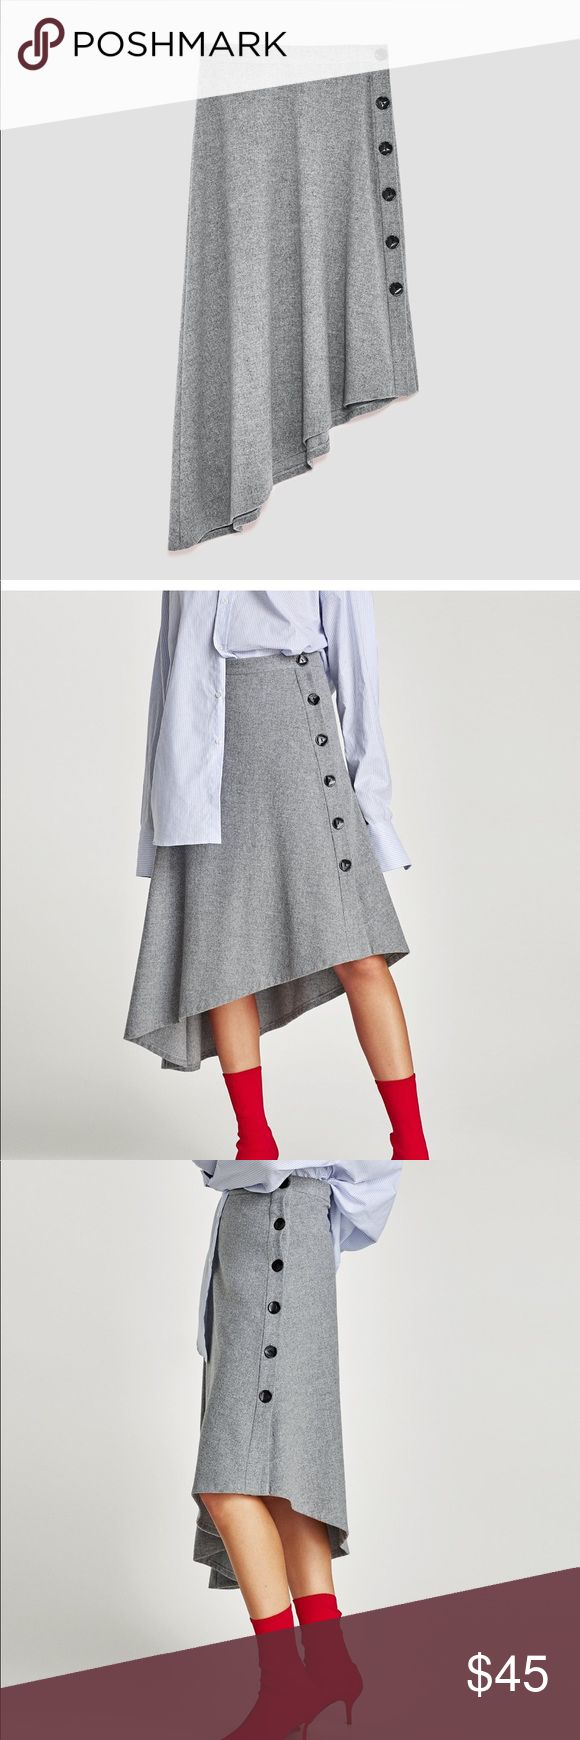 Zara Asymmetrical Midi Skirt Grey Asymmetrical Midi Skirt with Side Button Closure.  Wool Blend. Size L. New w/Tags Zara Skirts Midi